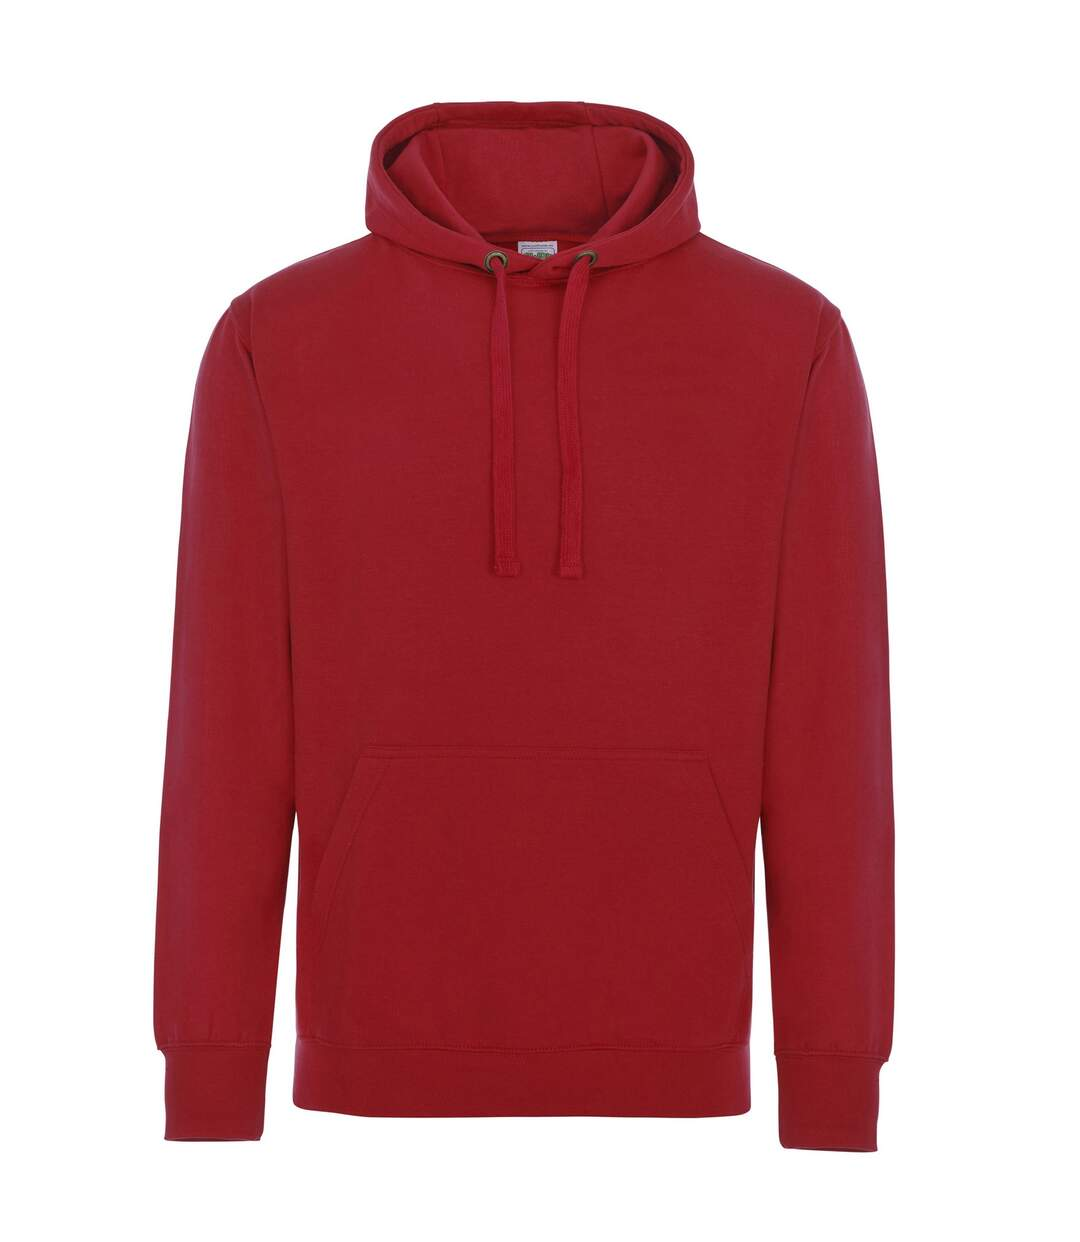 AWDis Just Hoods Adults Unisex Supersoft Hooded Sweatshirt/Hoodie (Grey) - UTRW3926